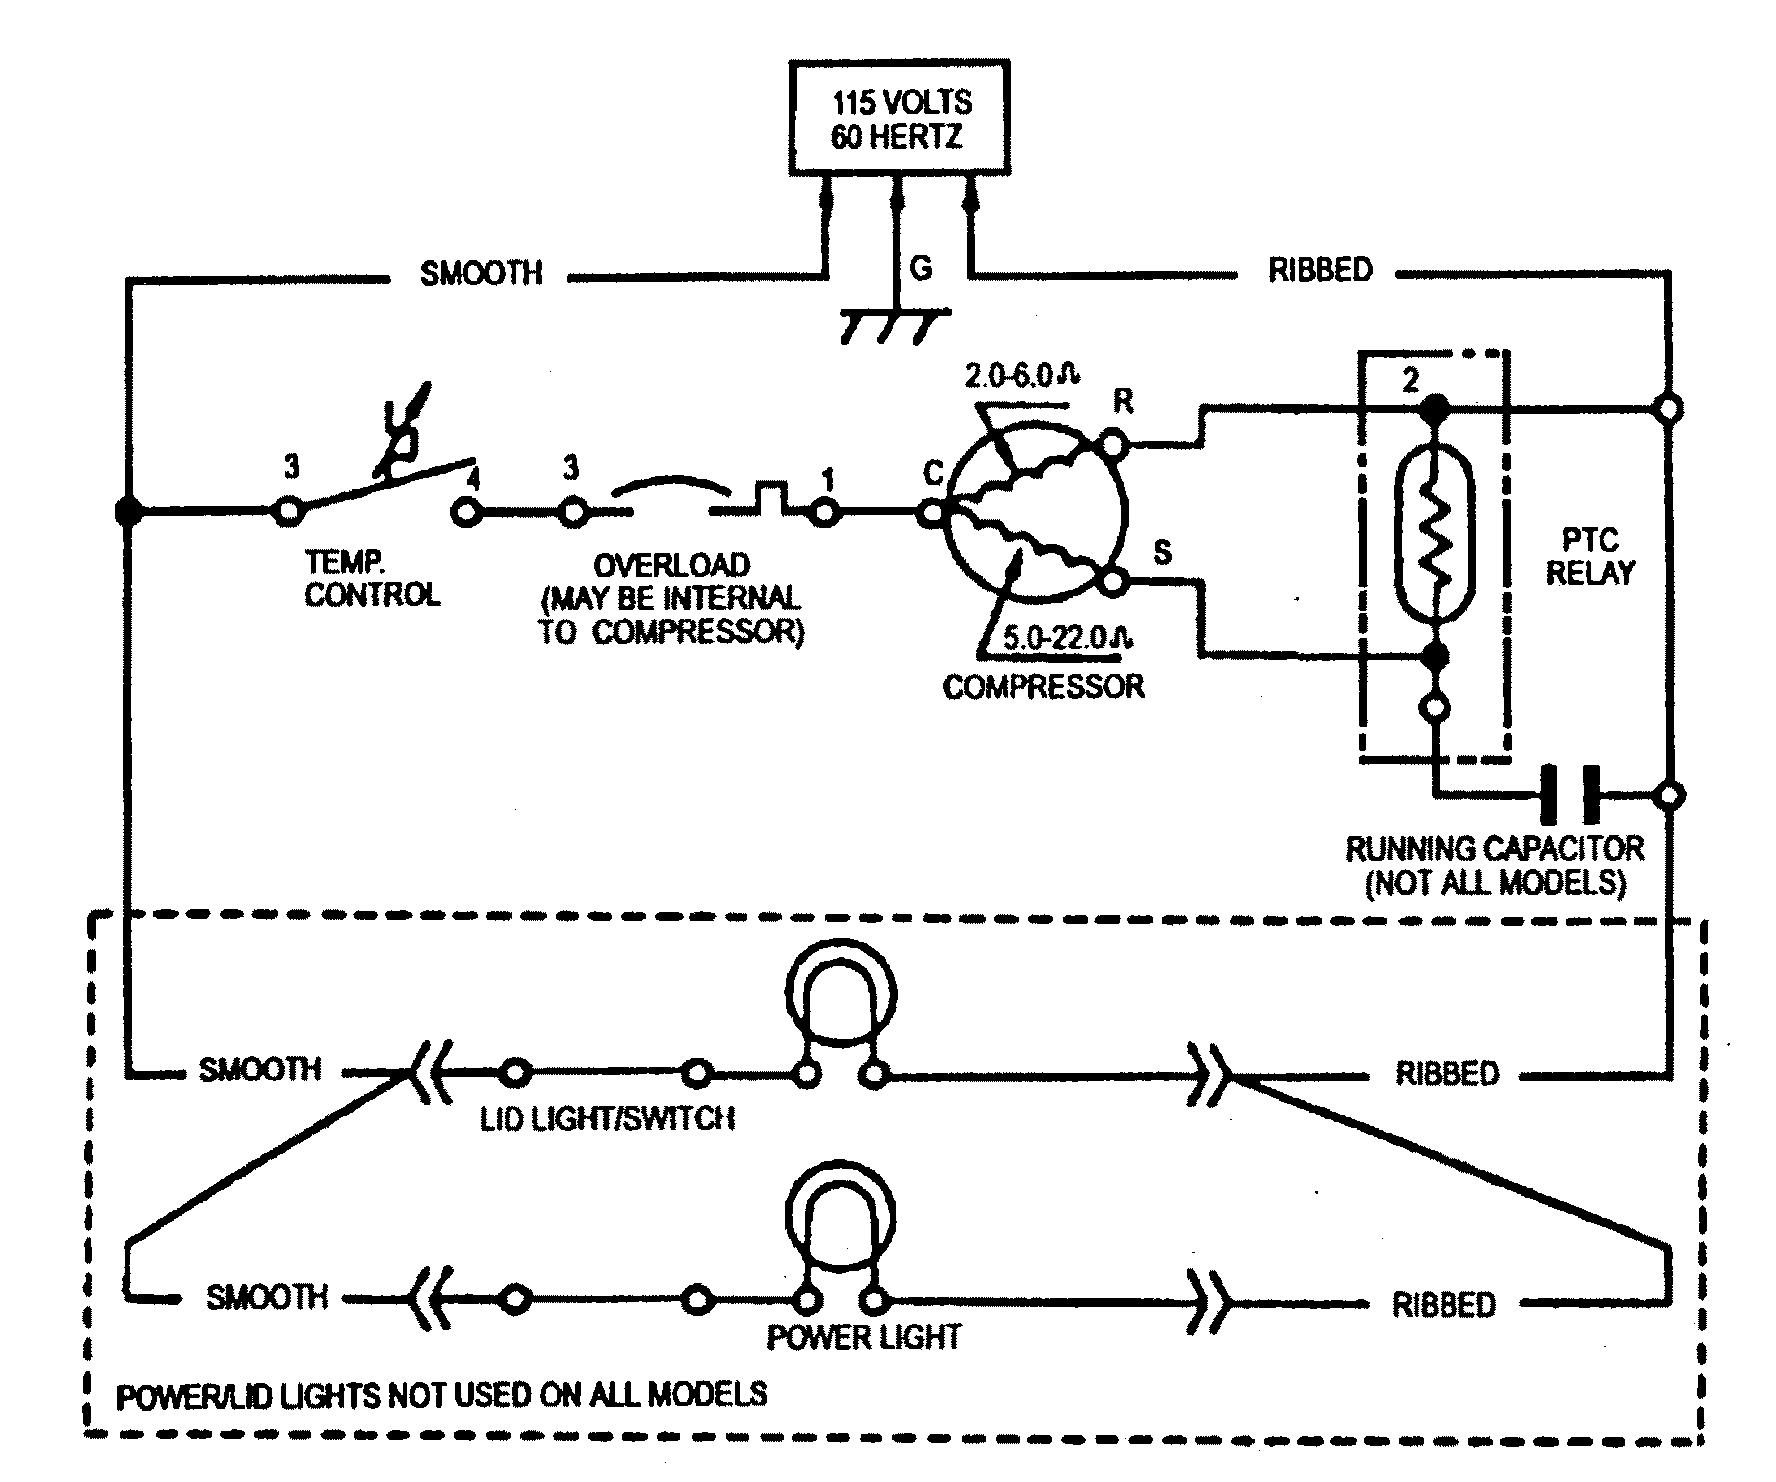 V23234 A1001 X036 Wiring Diagram 32 Images Paragon Defrost Timer Gandul 45 77 79 119 M0506137 00004resize